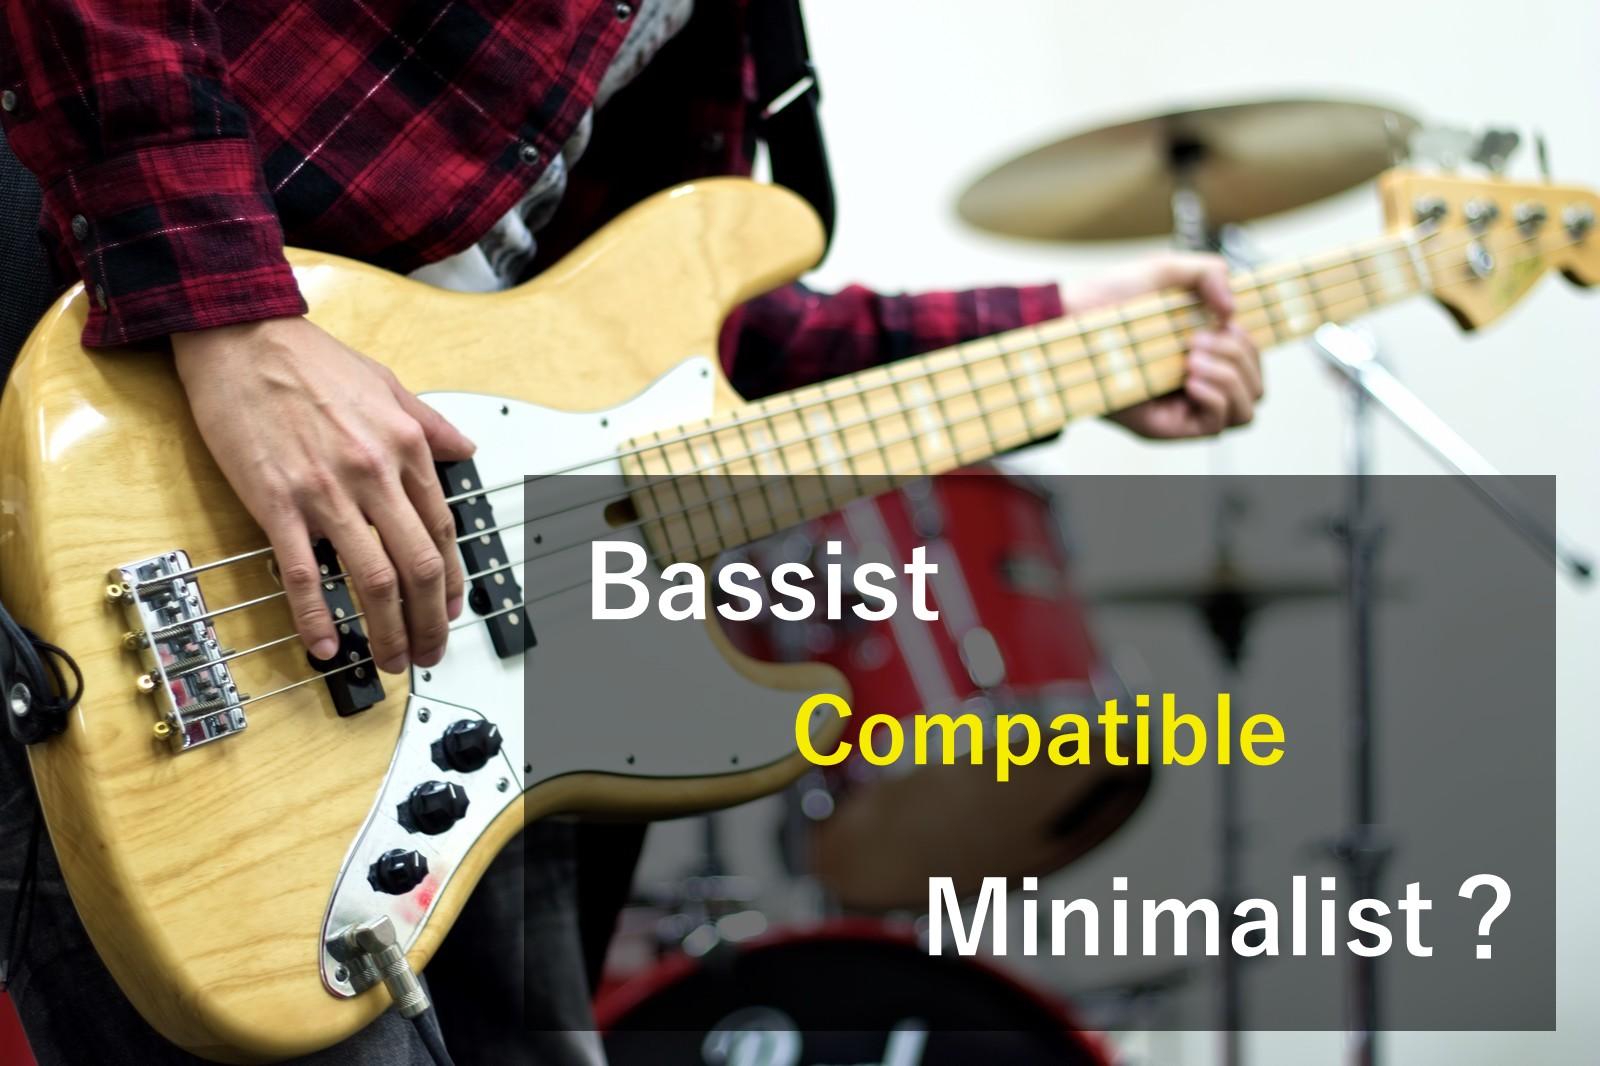 bassist-minimalist